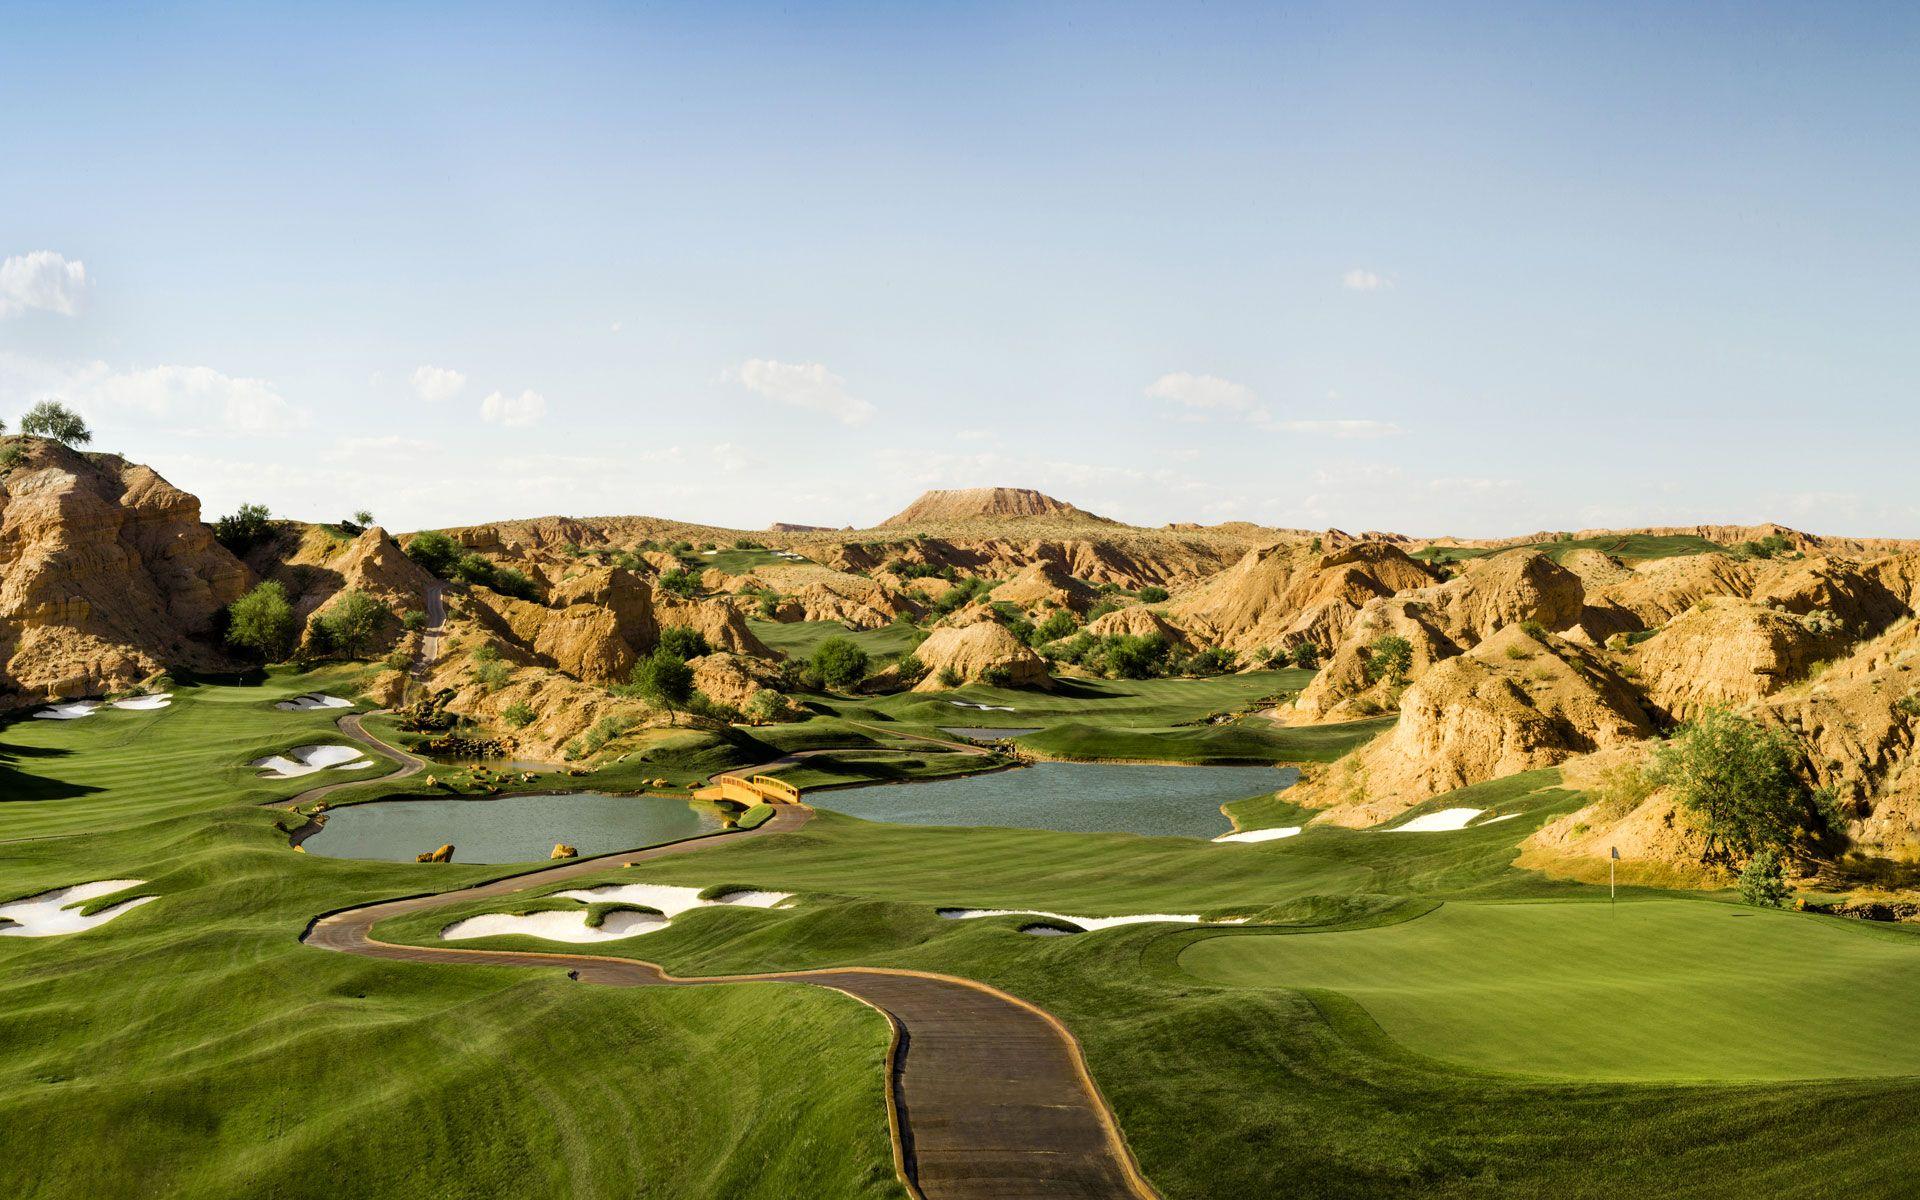 Las Vegas, Nevada Mesquite Courses Wolf Creek Golf